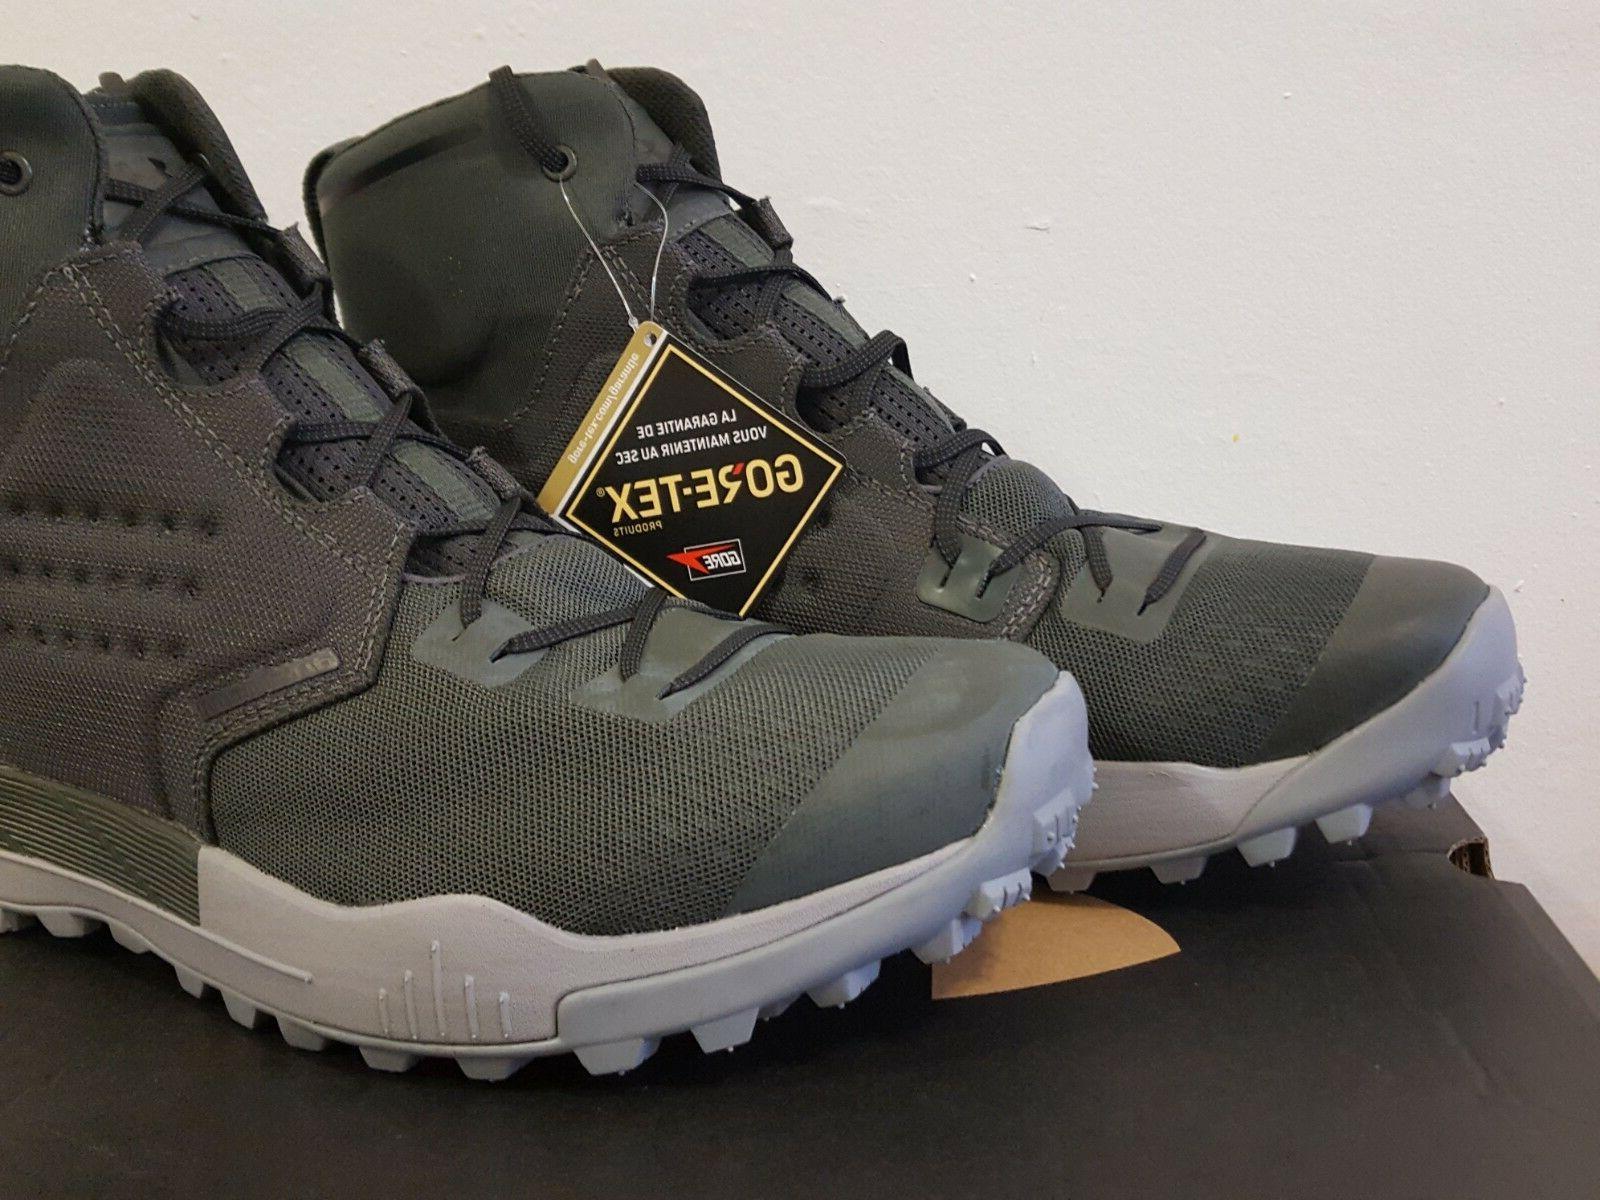 separation shoes ef180 41140 Under Armour UA Newell Ridge Mid GTX Gore-Tex